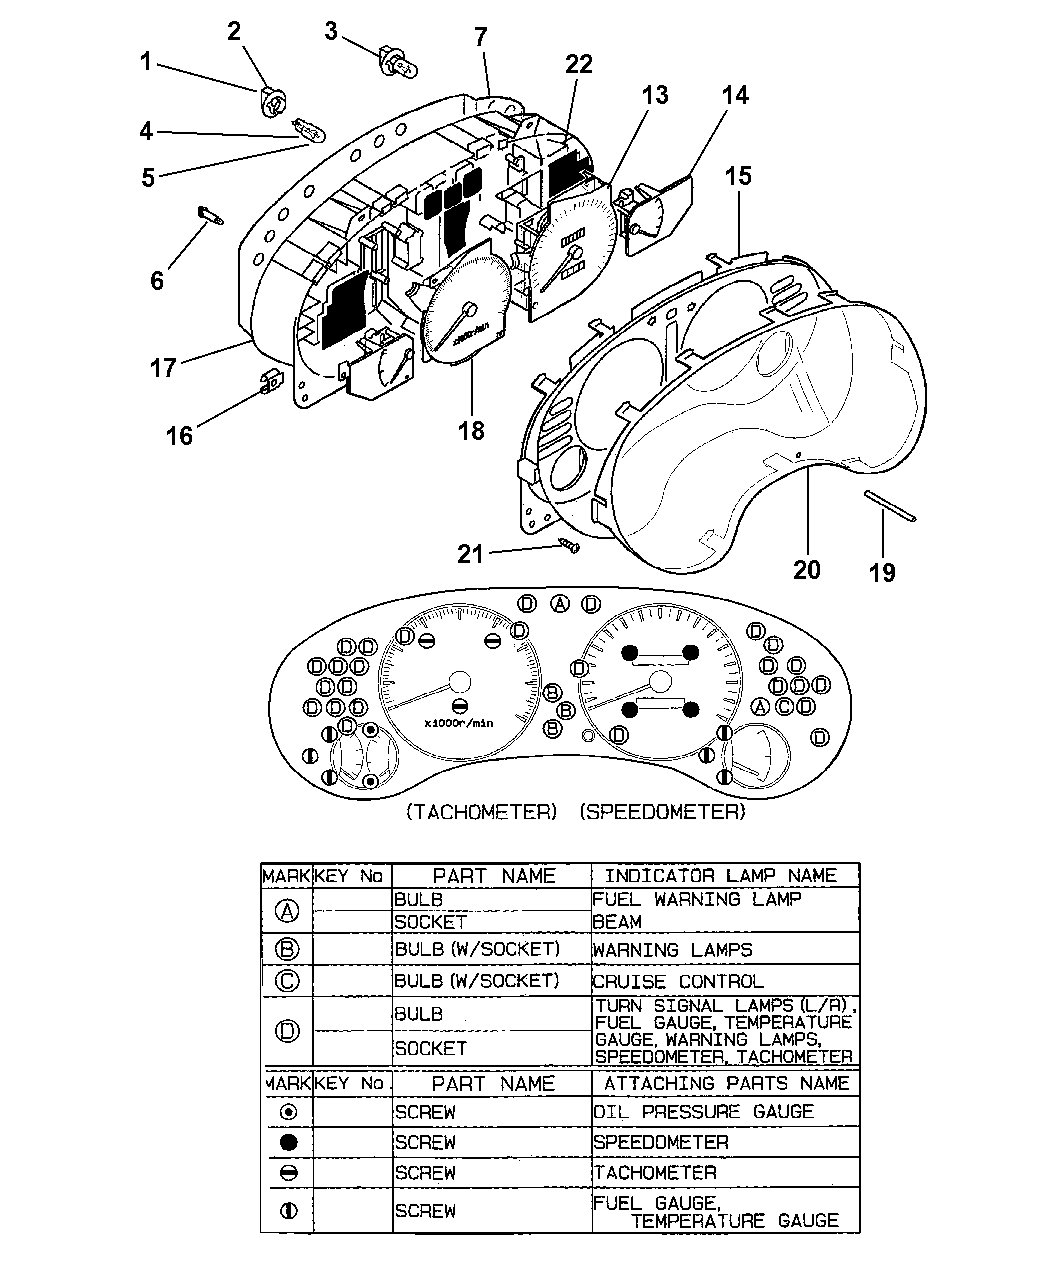 Mc883599 Genuine Mopar Screw Gauge Mounting